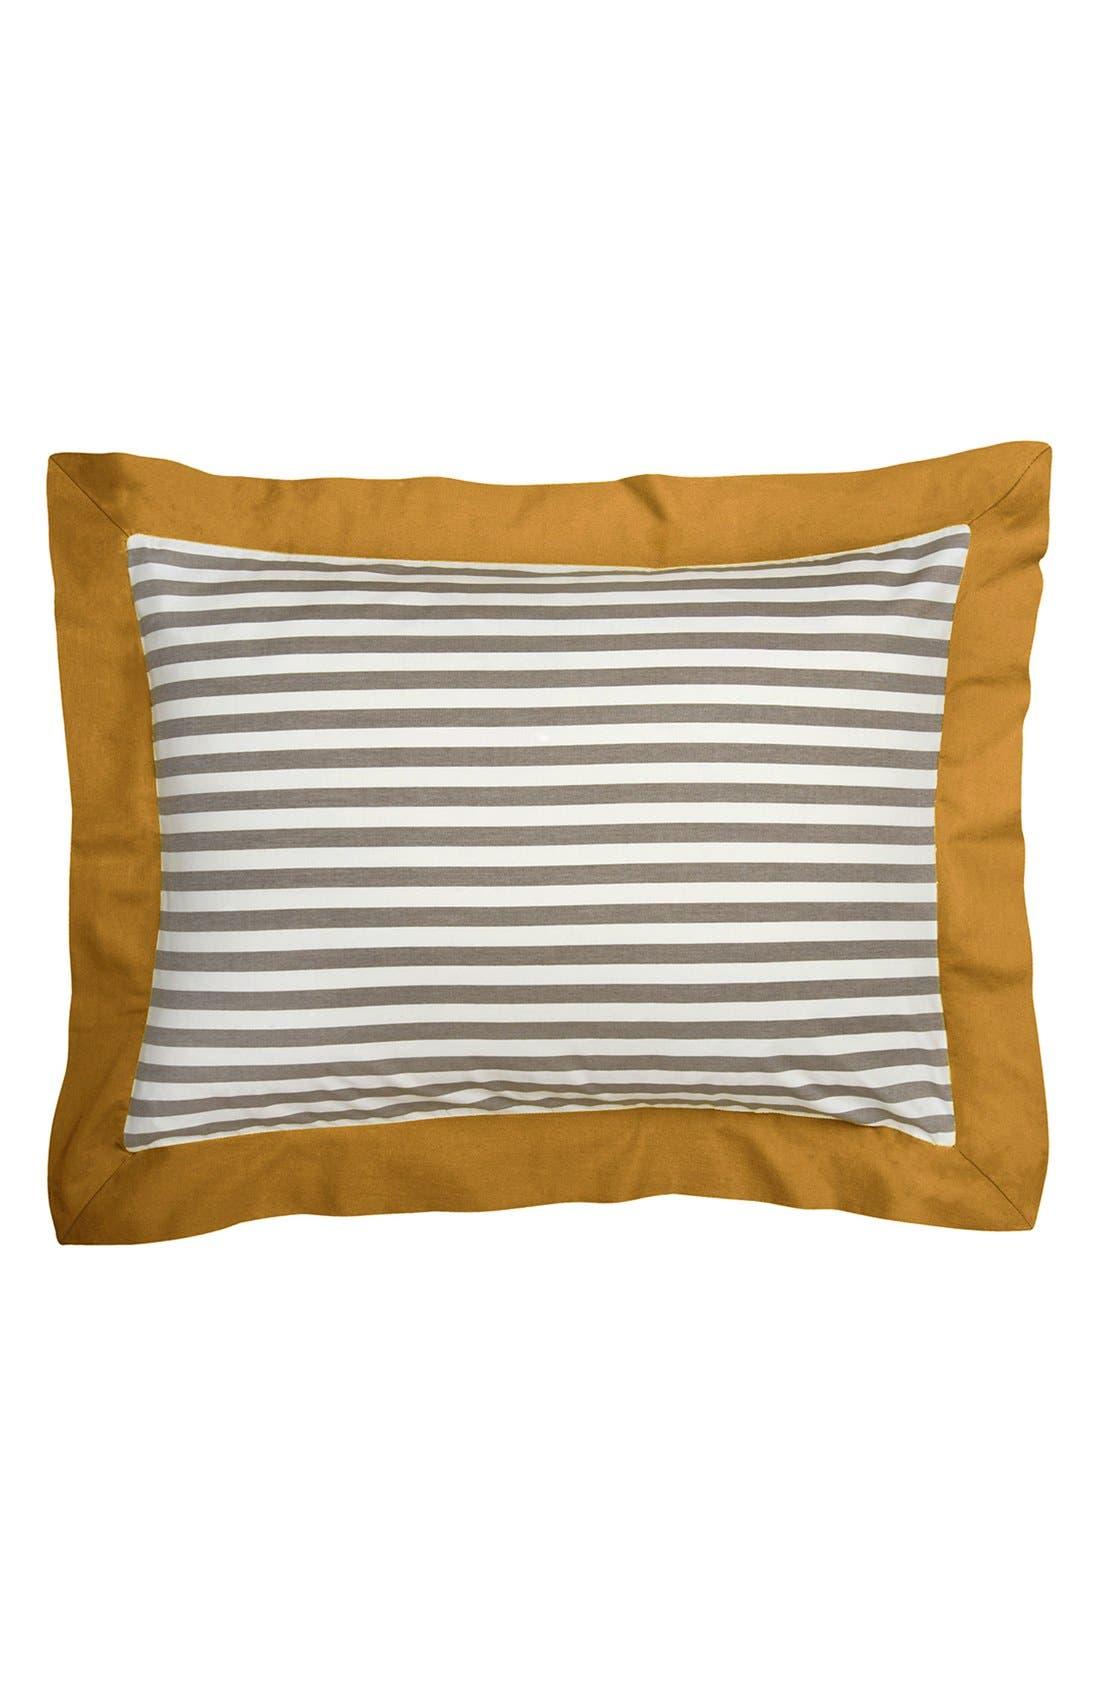 'Draper' Stripe Shams,                         Main,                         color, 700